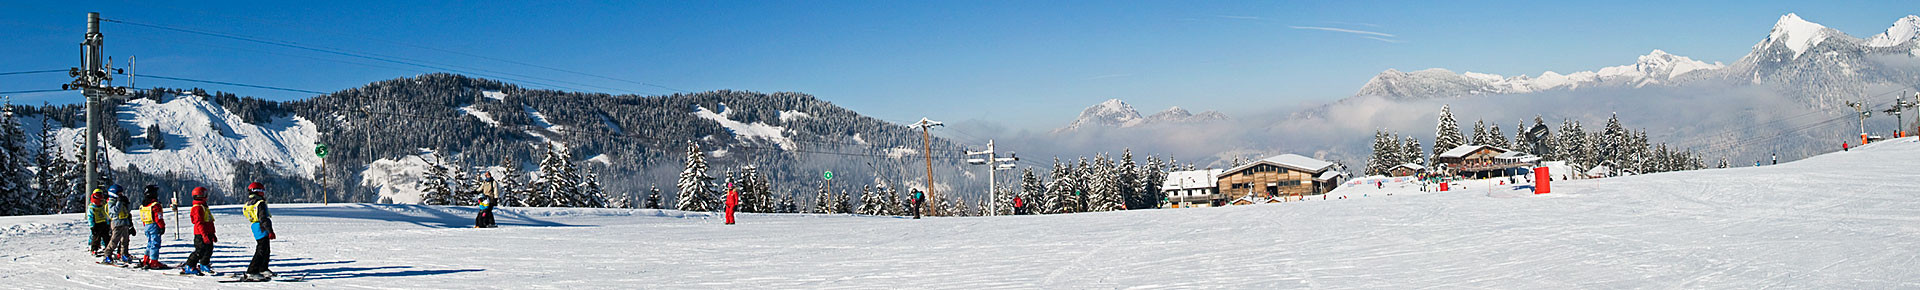 visite virtuelle hiver